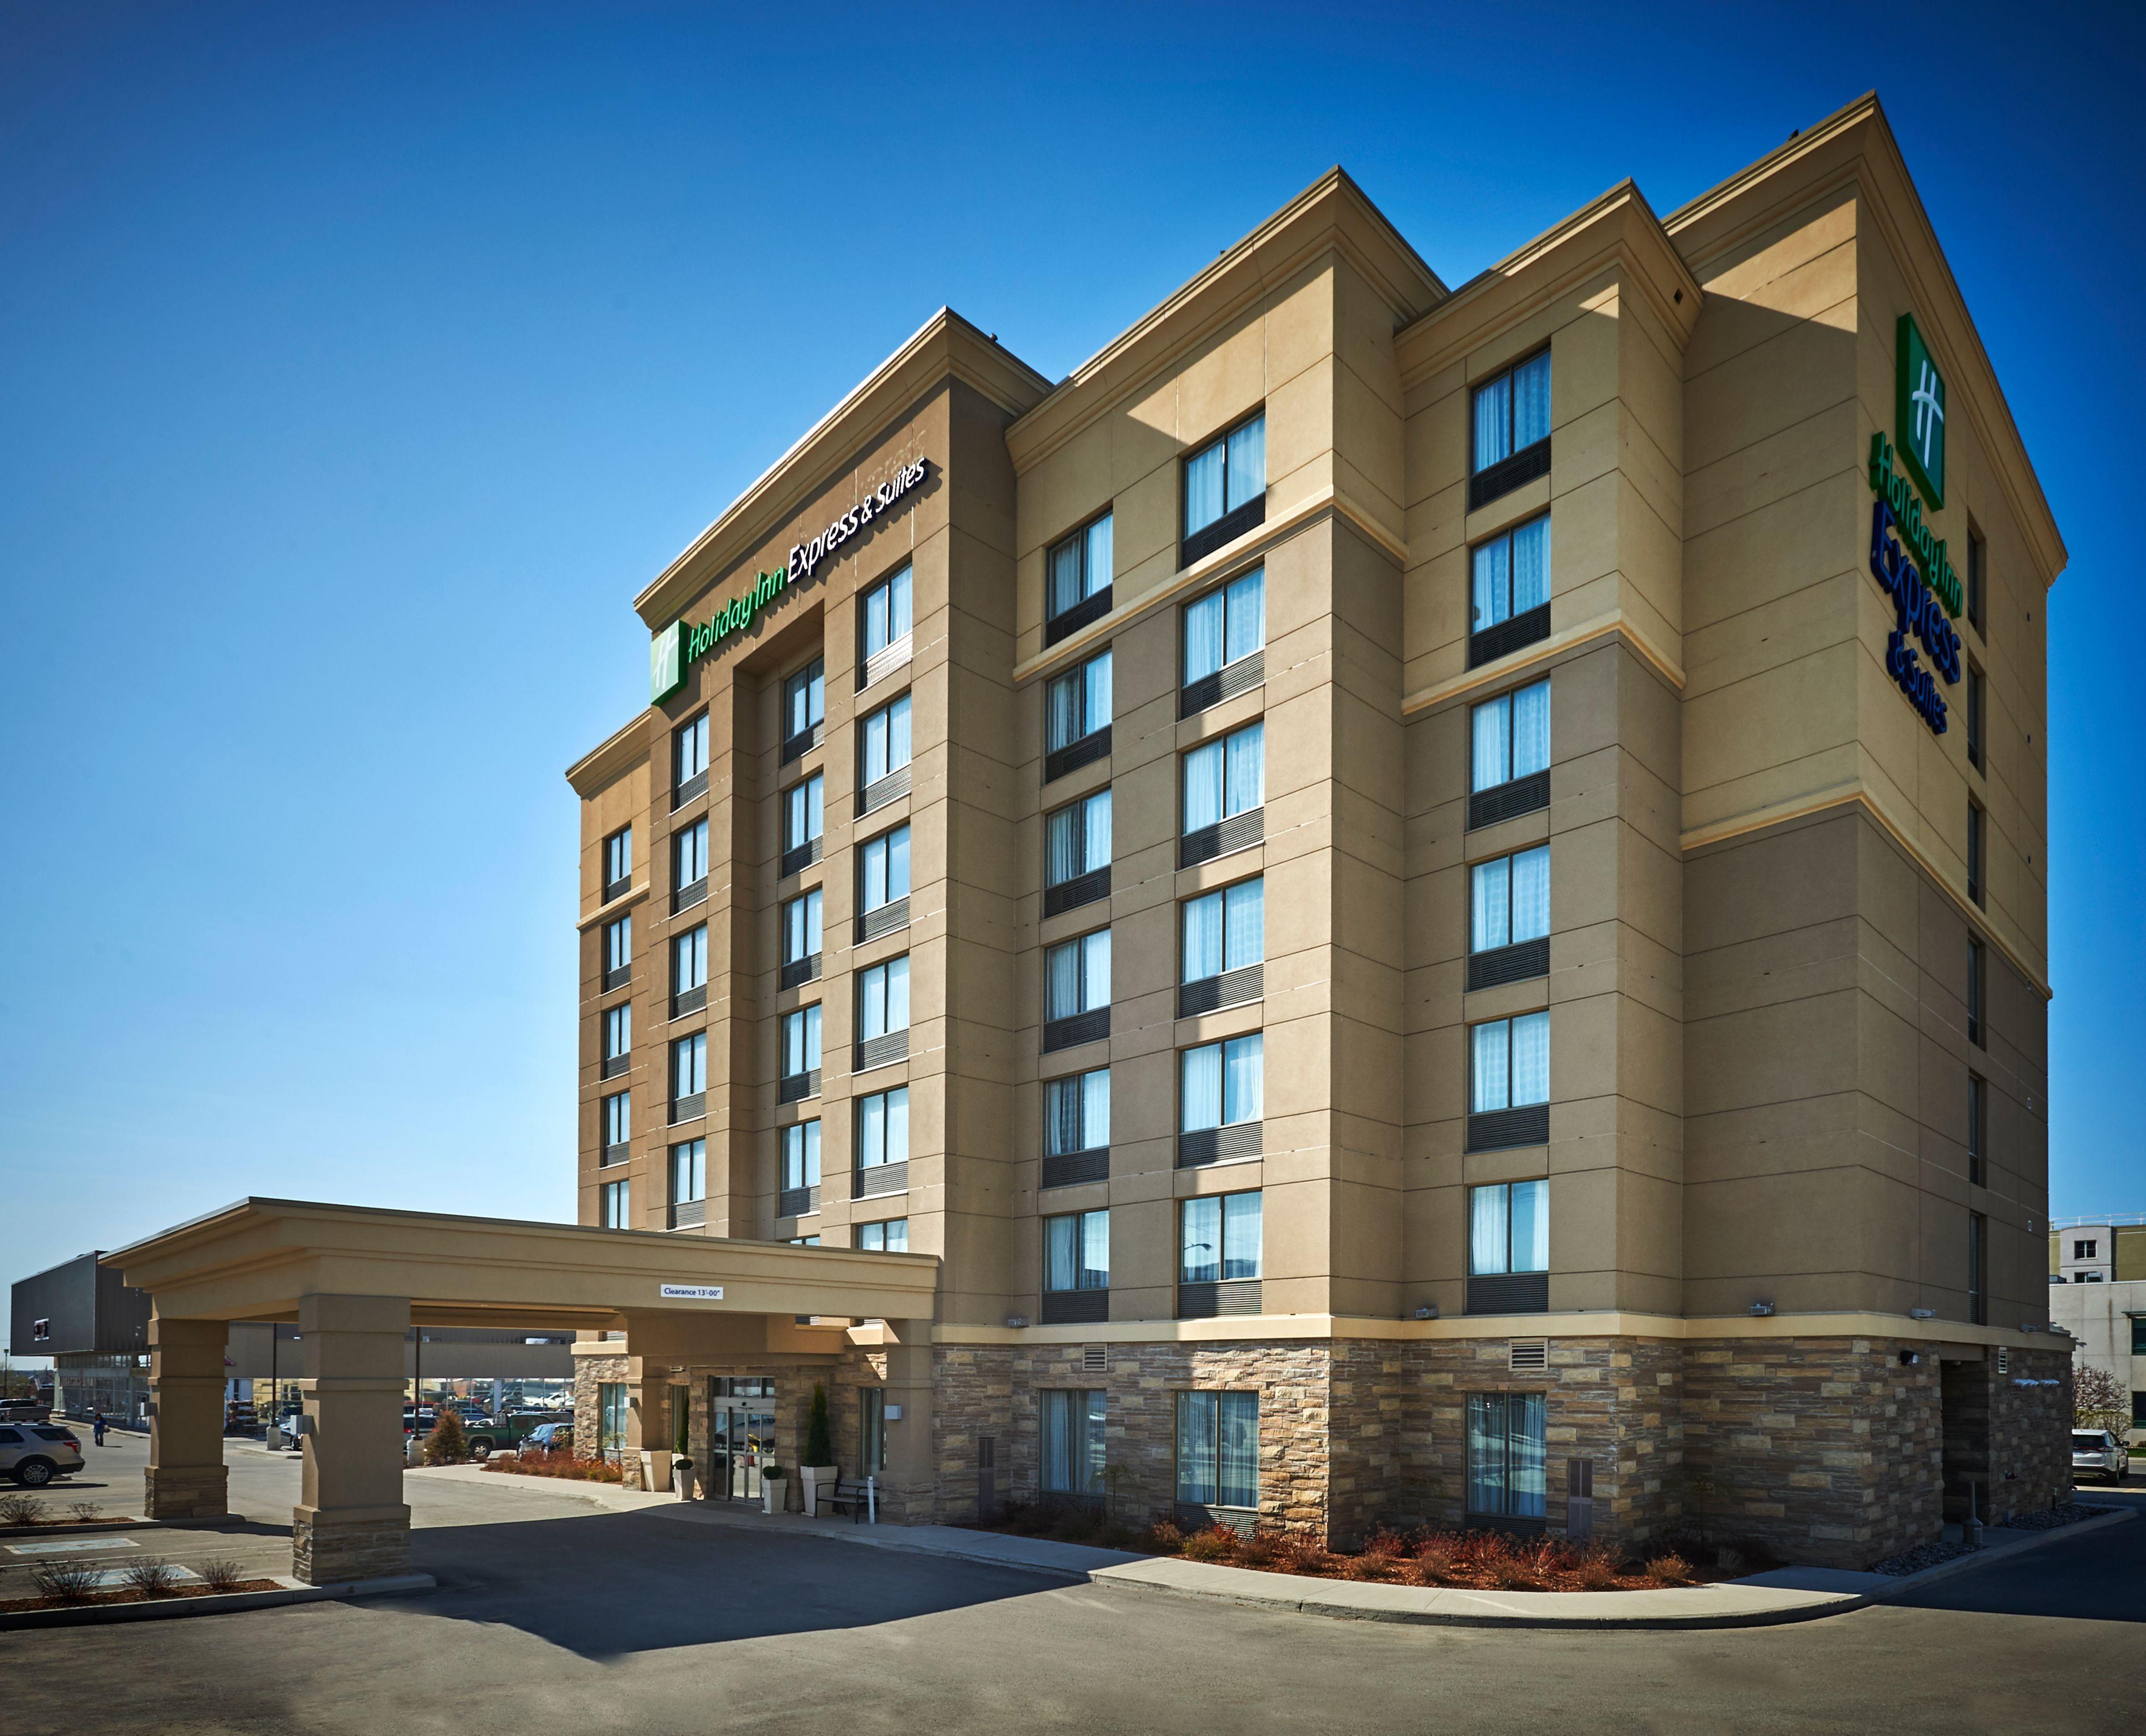 Holiday Inn Express & Suites Tilton - Lakes Region image 5